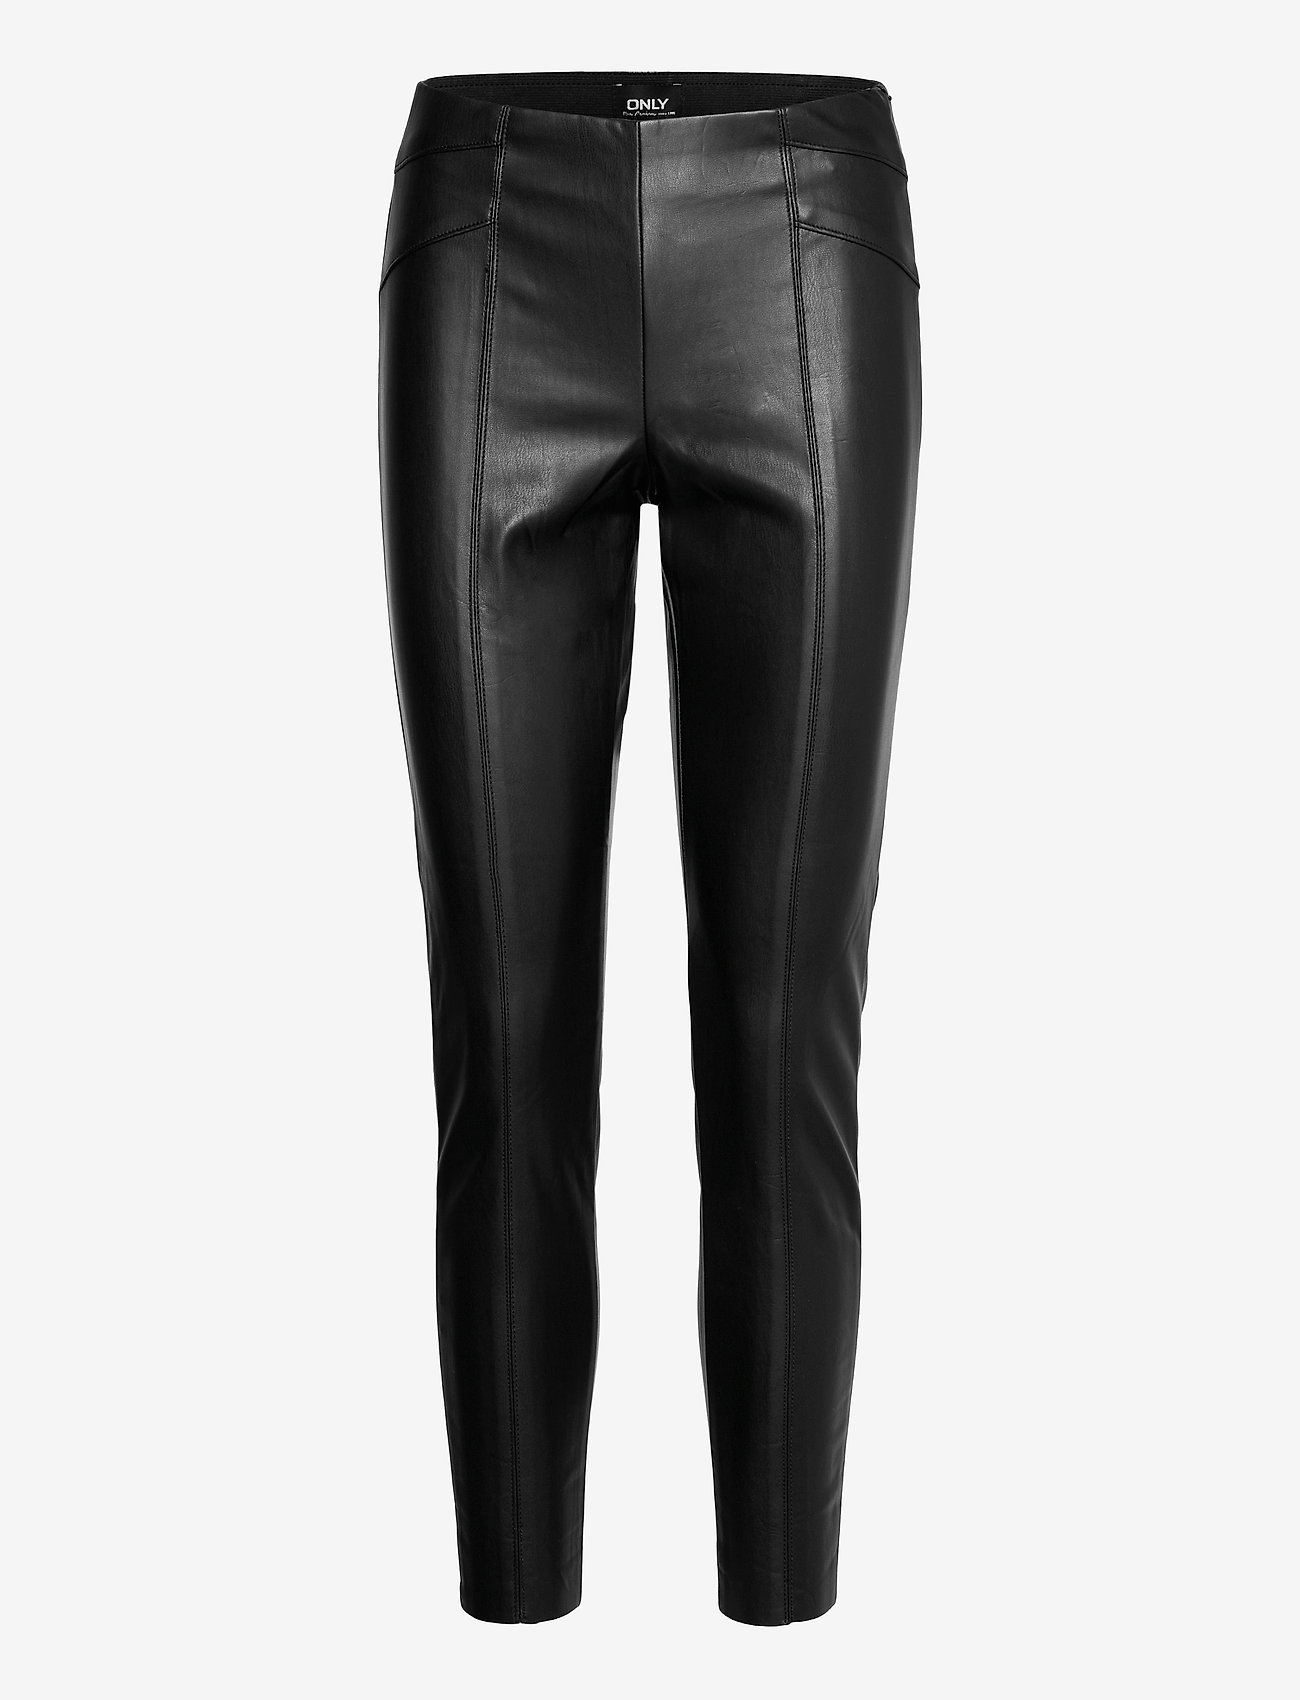 ONLY - ONLJOLEE FAUX LEAHTER CUT LEGGING PNT - læderbukser - black - 0